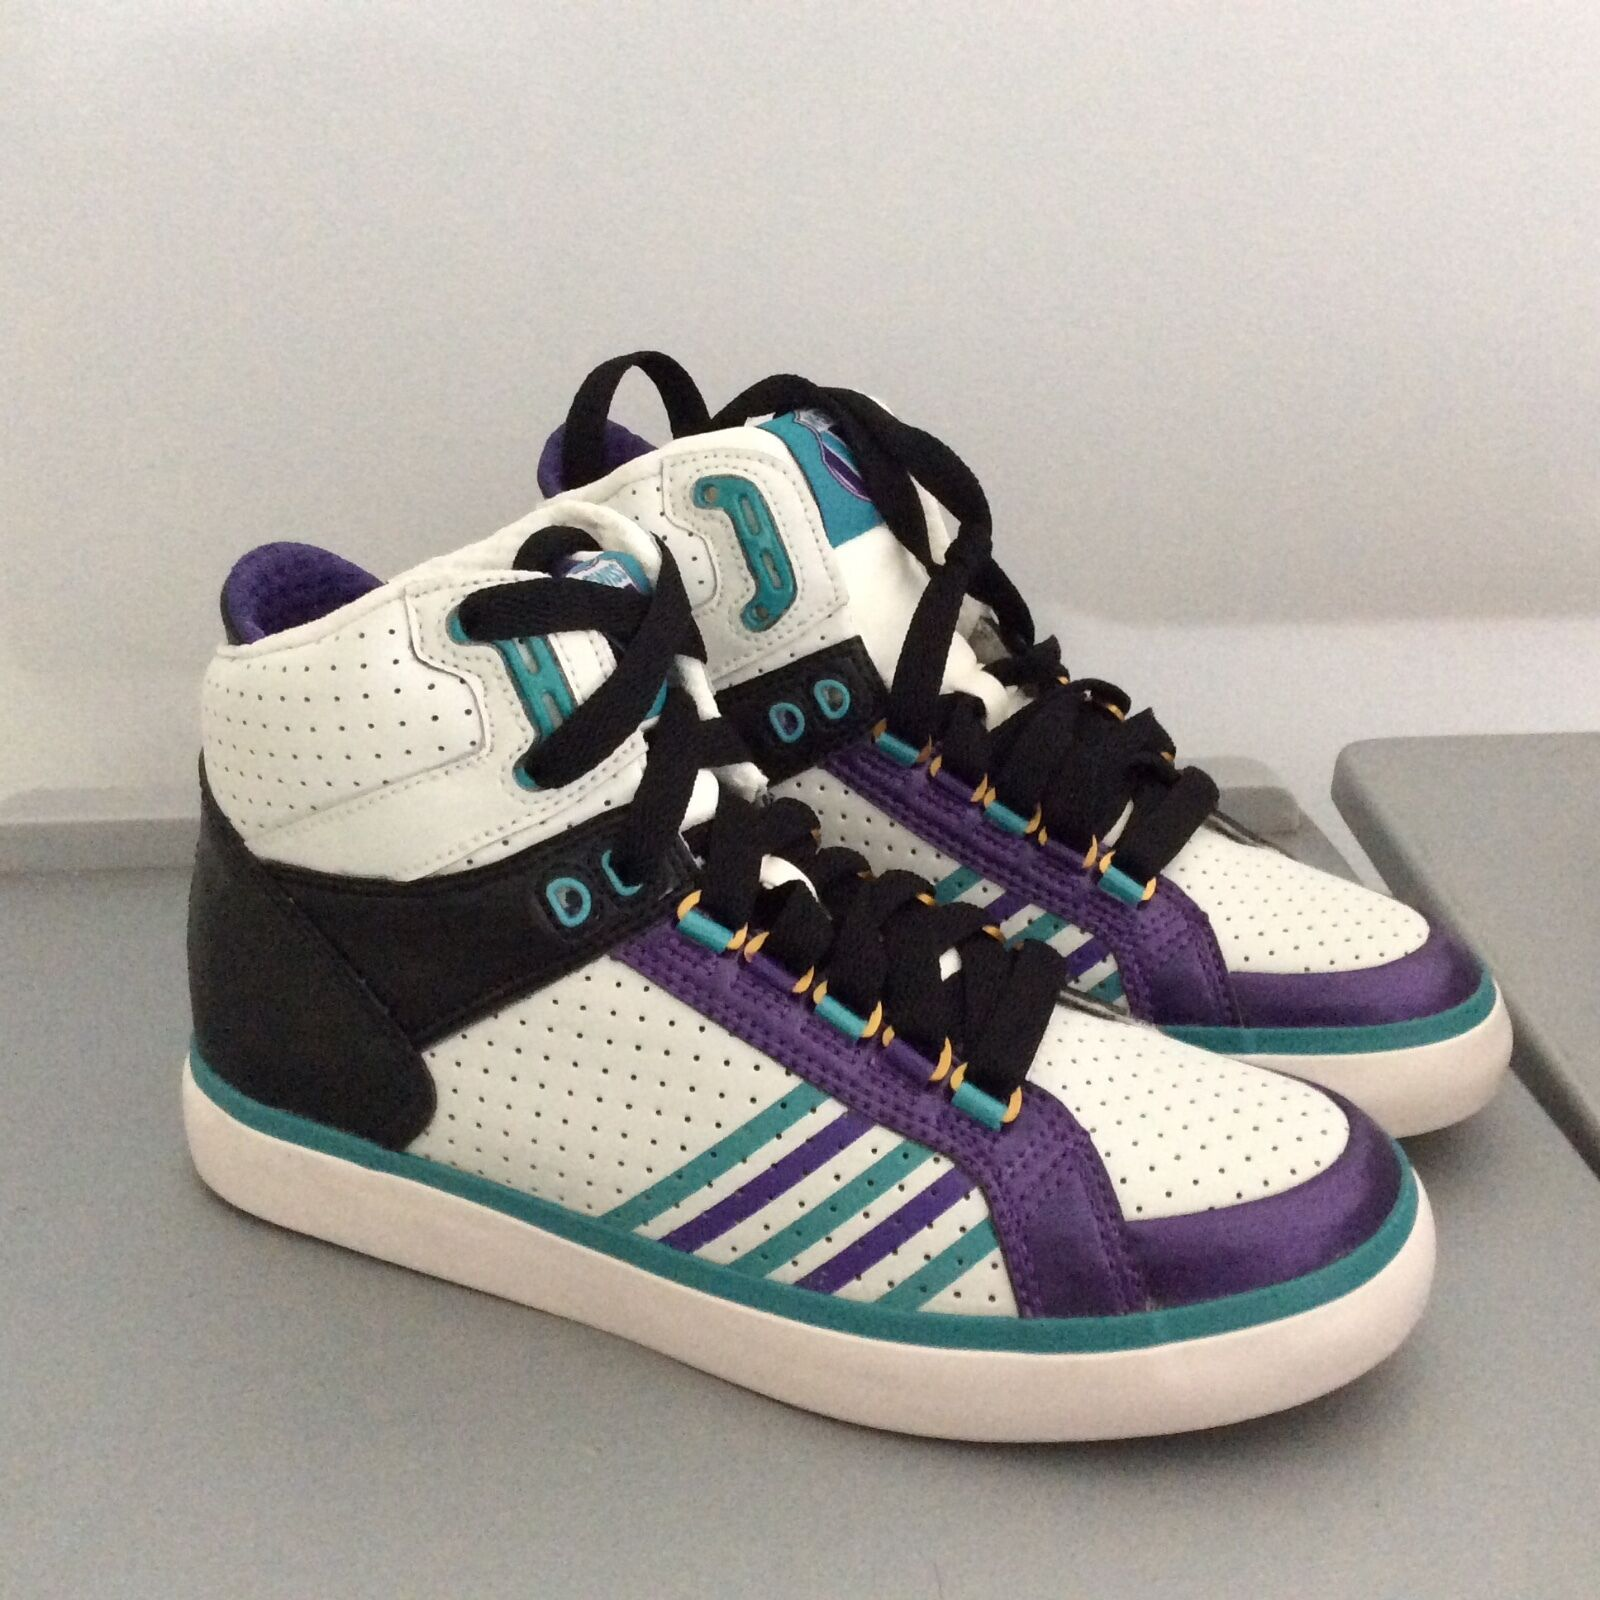 K Swiss Venezien Damen Schuhe Loe 5 1 2 M Weiß Türkis Lila Athletic Neu